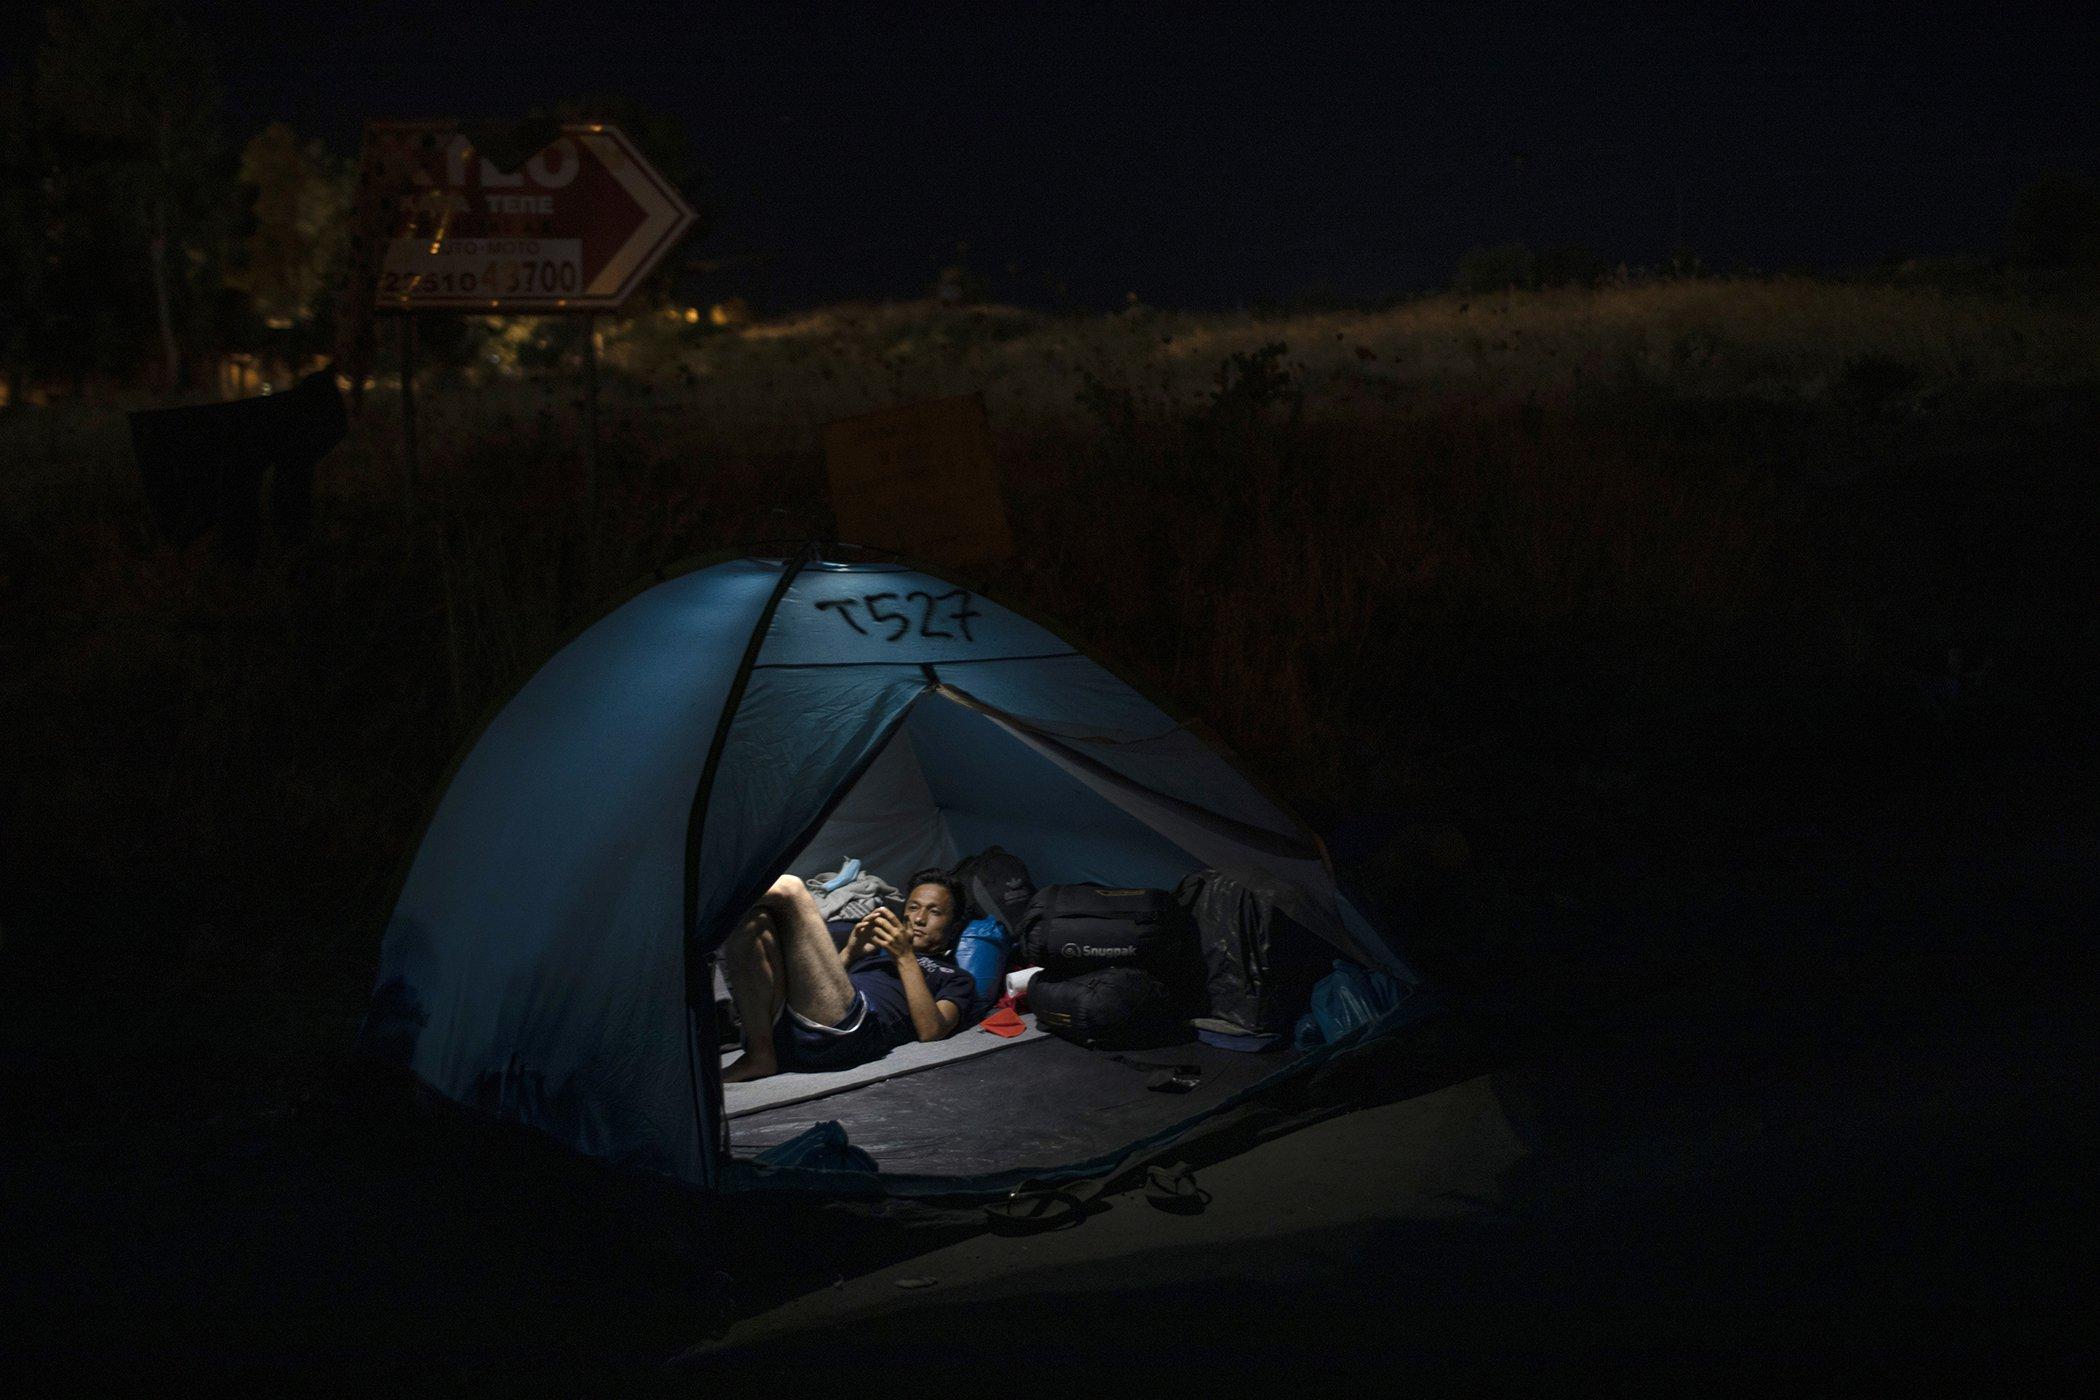 Moria-Refugee-Camp-Greece-Aftermath-Fires-003.jpg